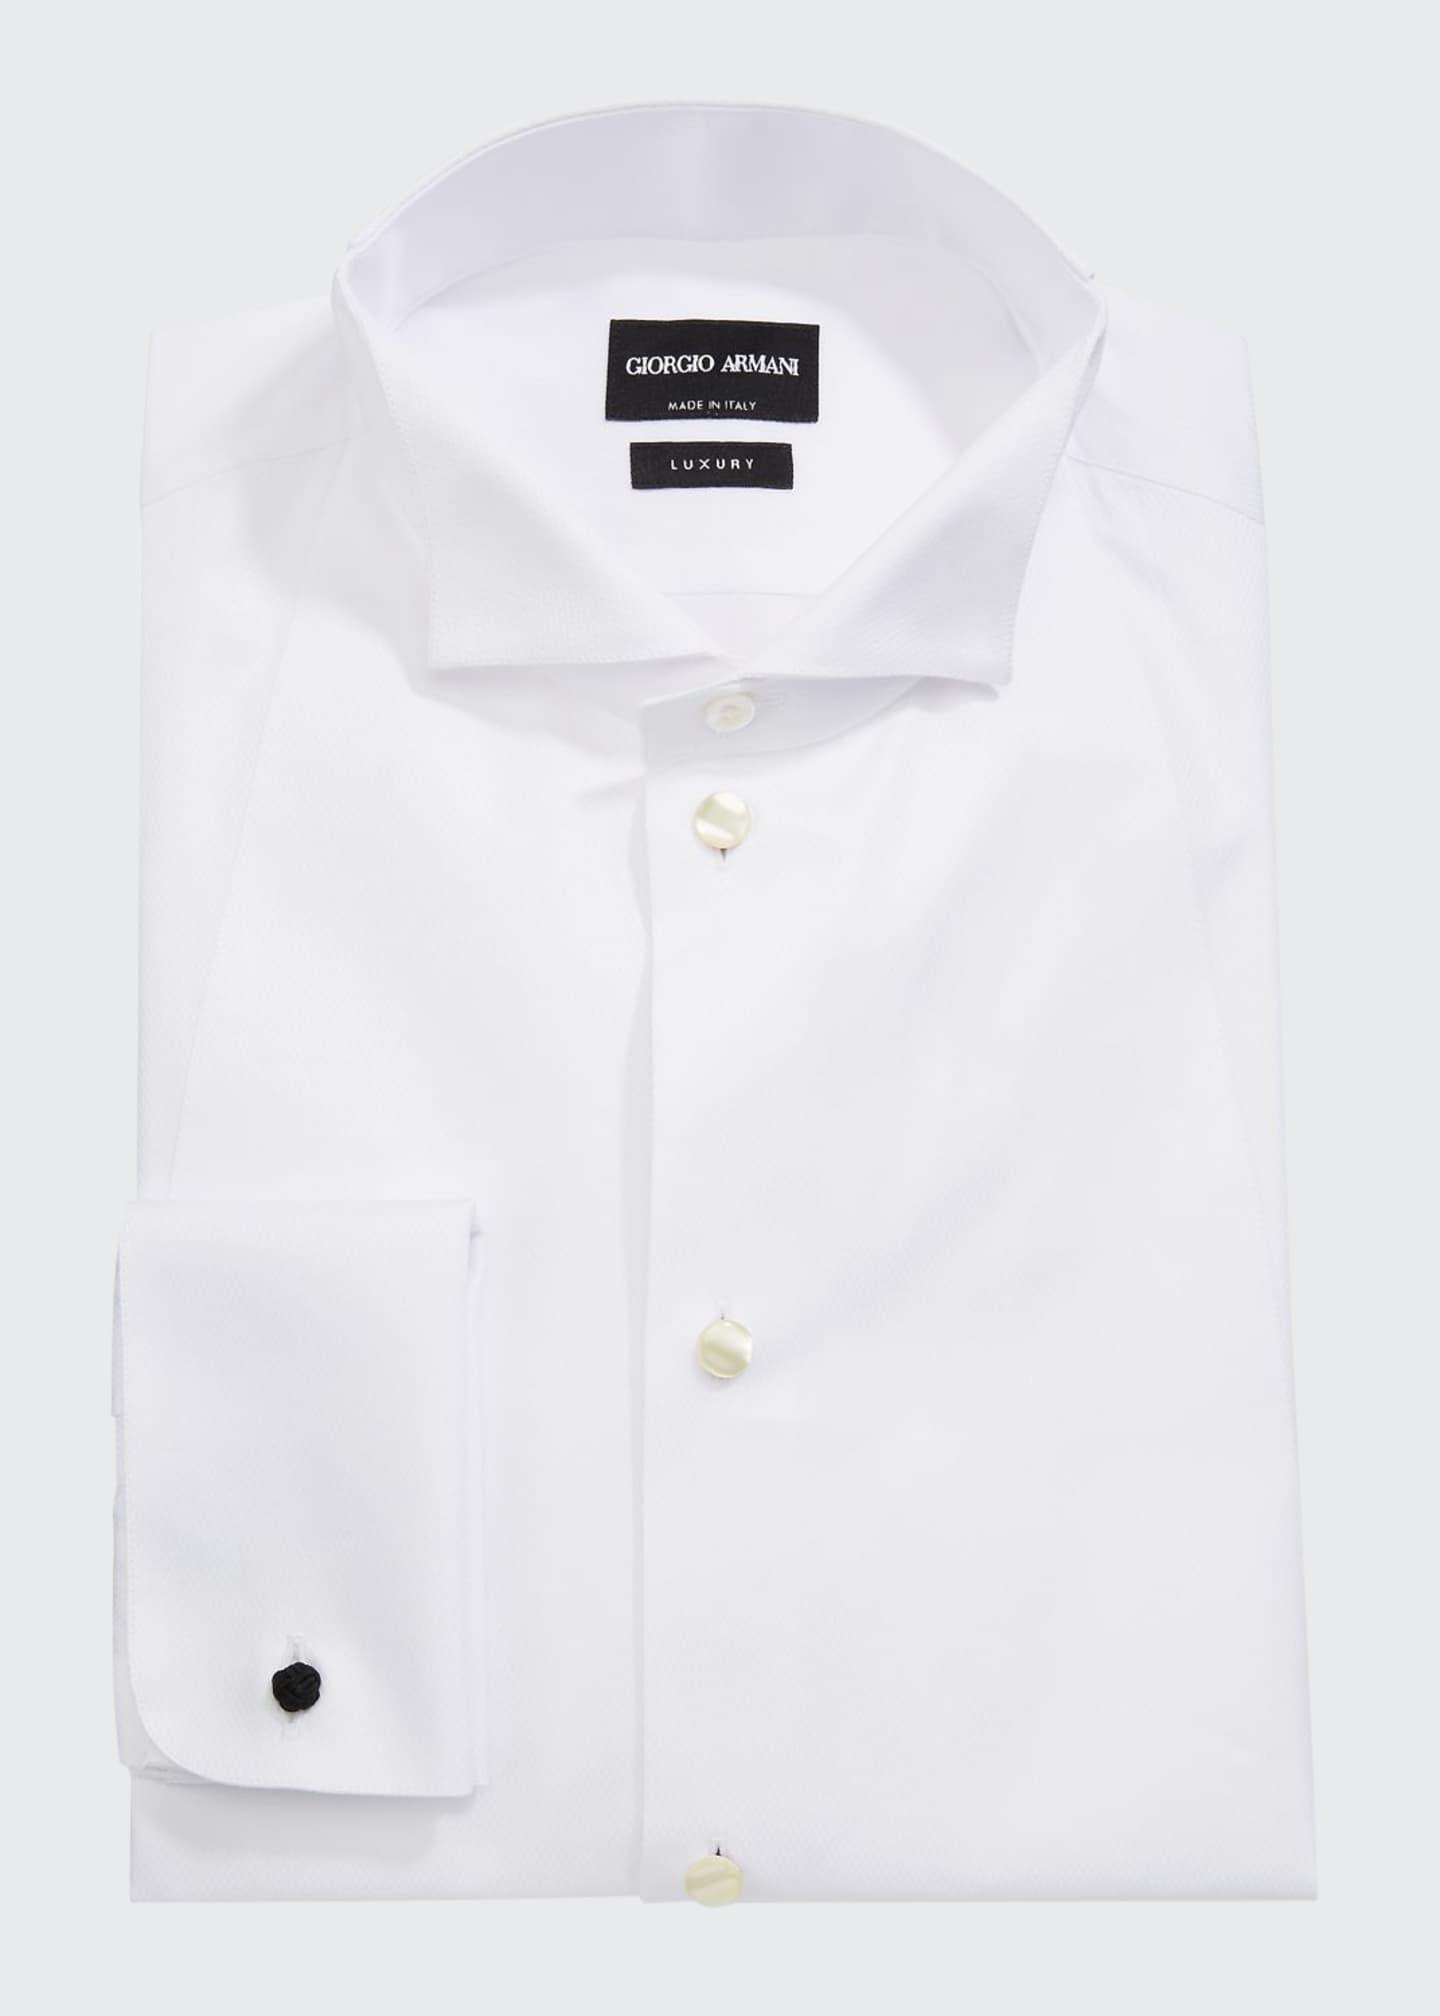 Giorgio Armani Men's Front Bib Formal Tuxedo Shirt